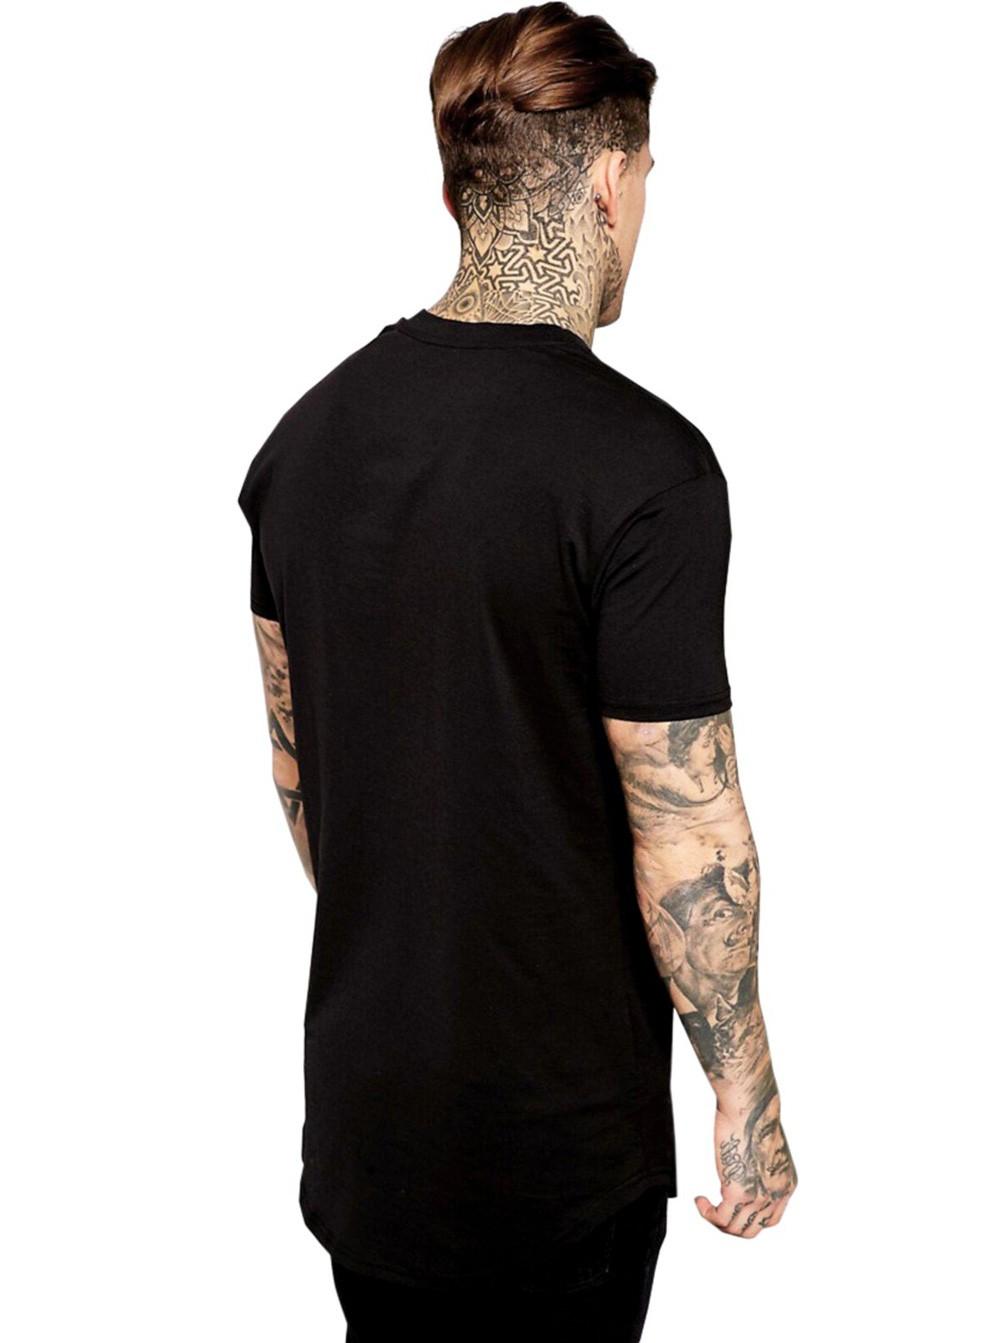 Camiseta Masculina Oversized Long Line Academia Go Hard Or Go Home ER_153